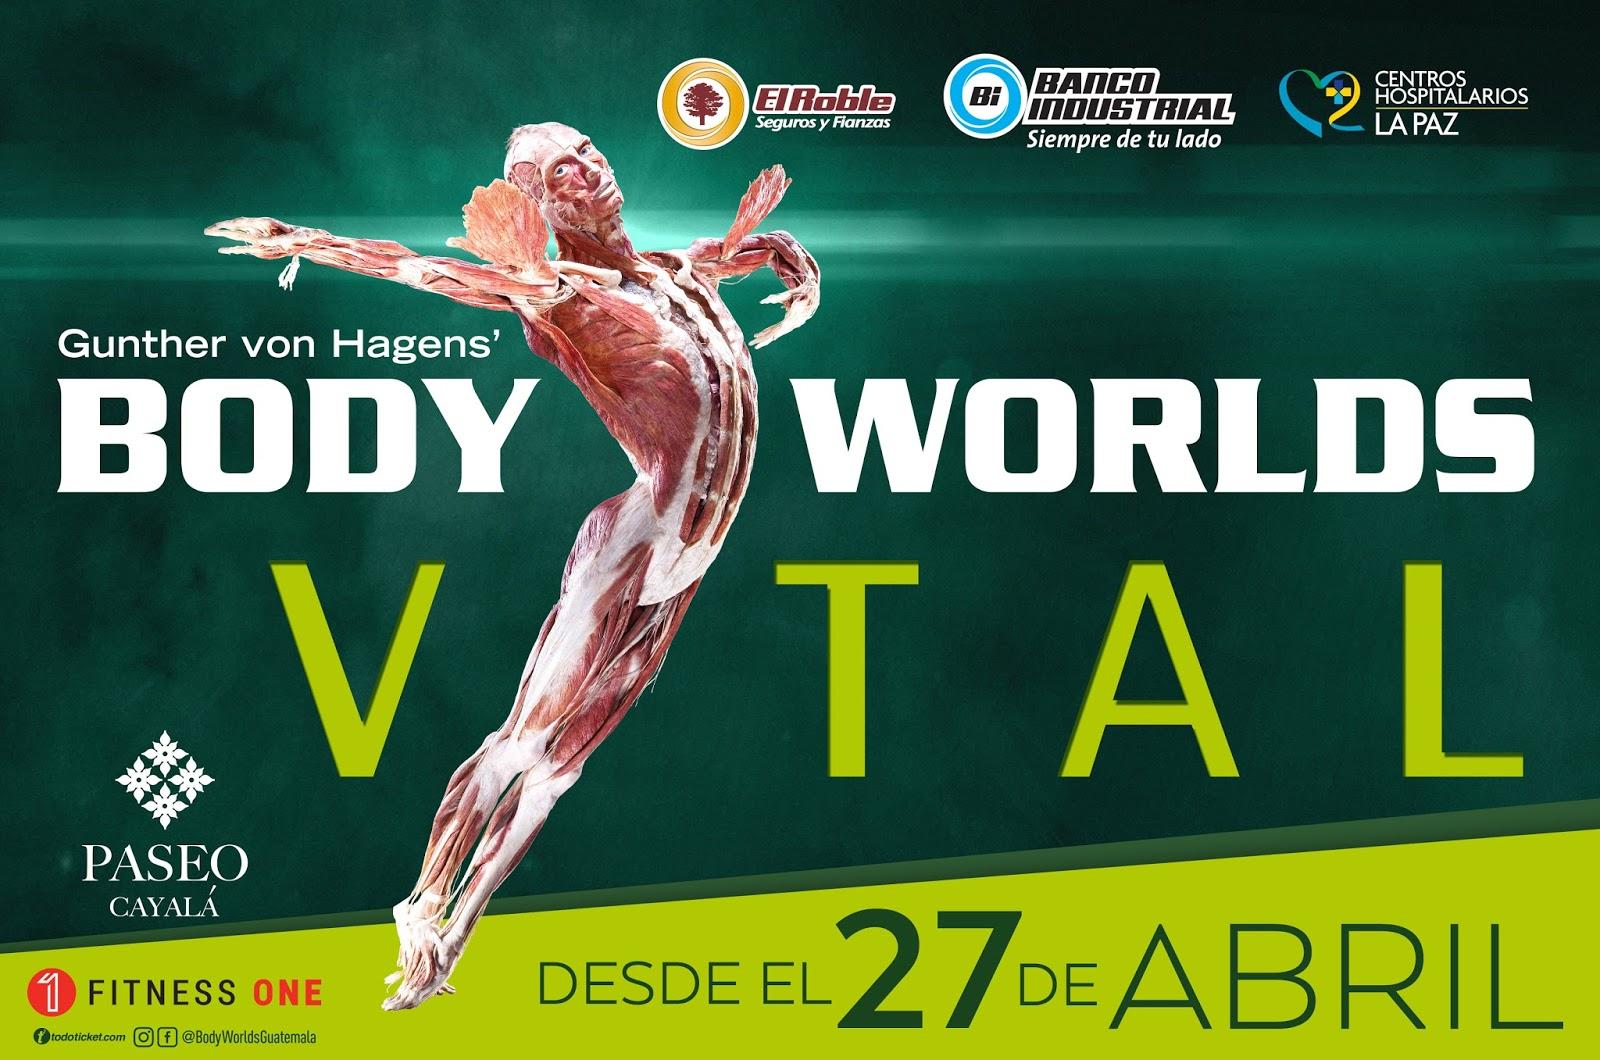 Body Worlds regresa a Guatemala en Abril - puntoguate.com